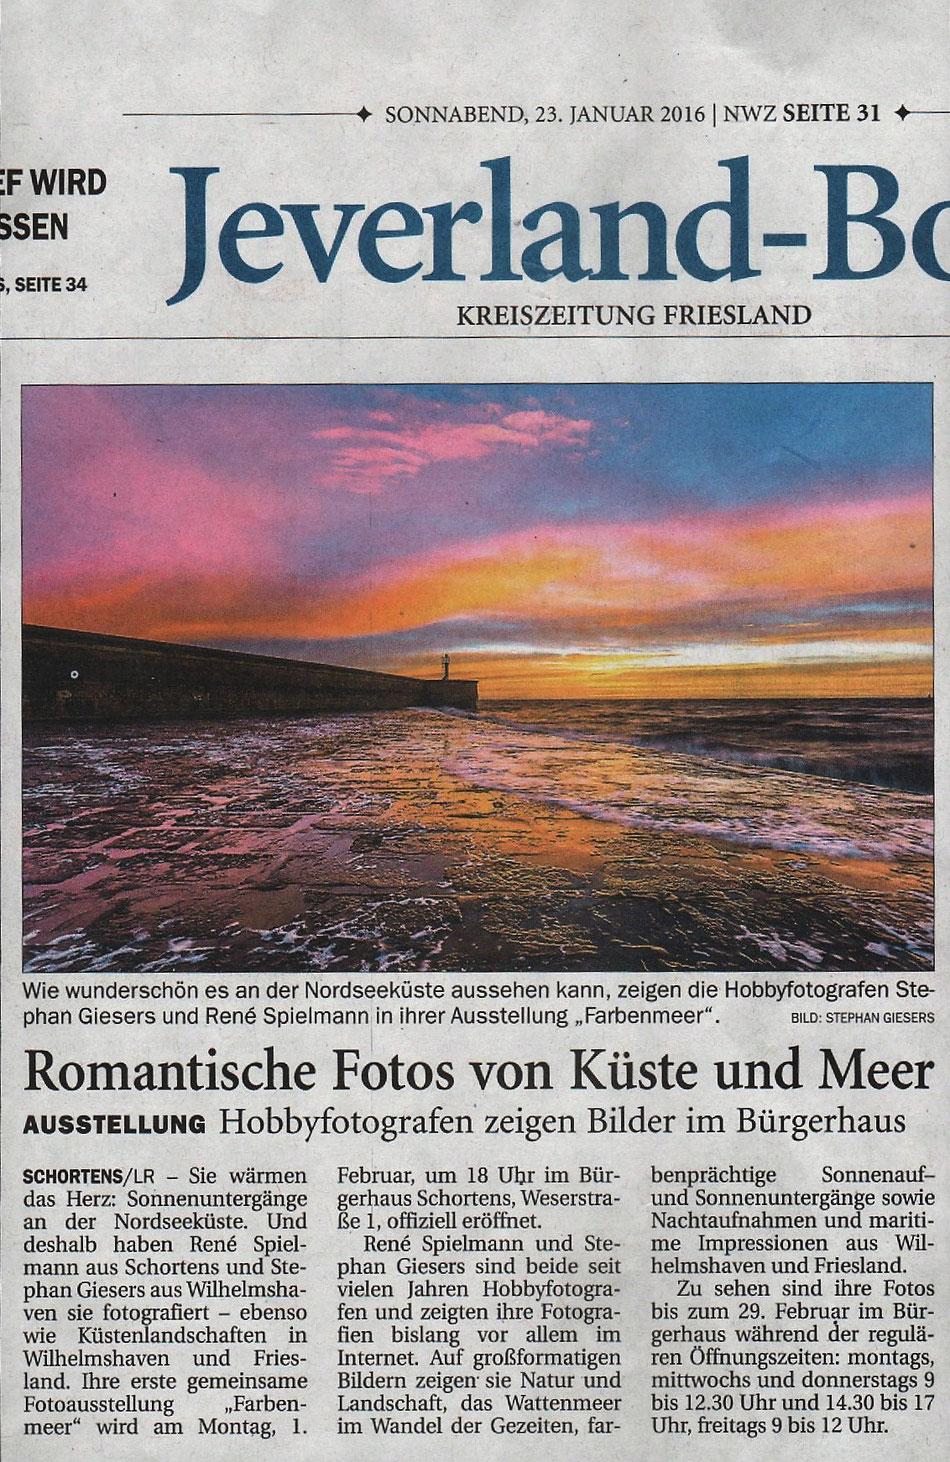 Nordwest-Zeitung NWZ, Jeverland-Bote, 23. Januar 2016